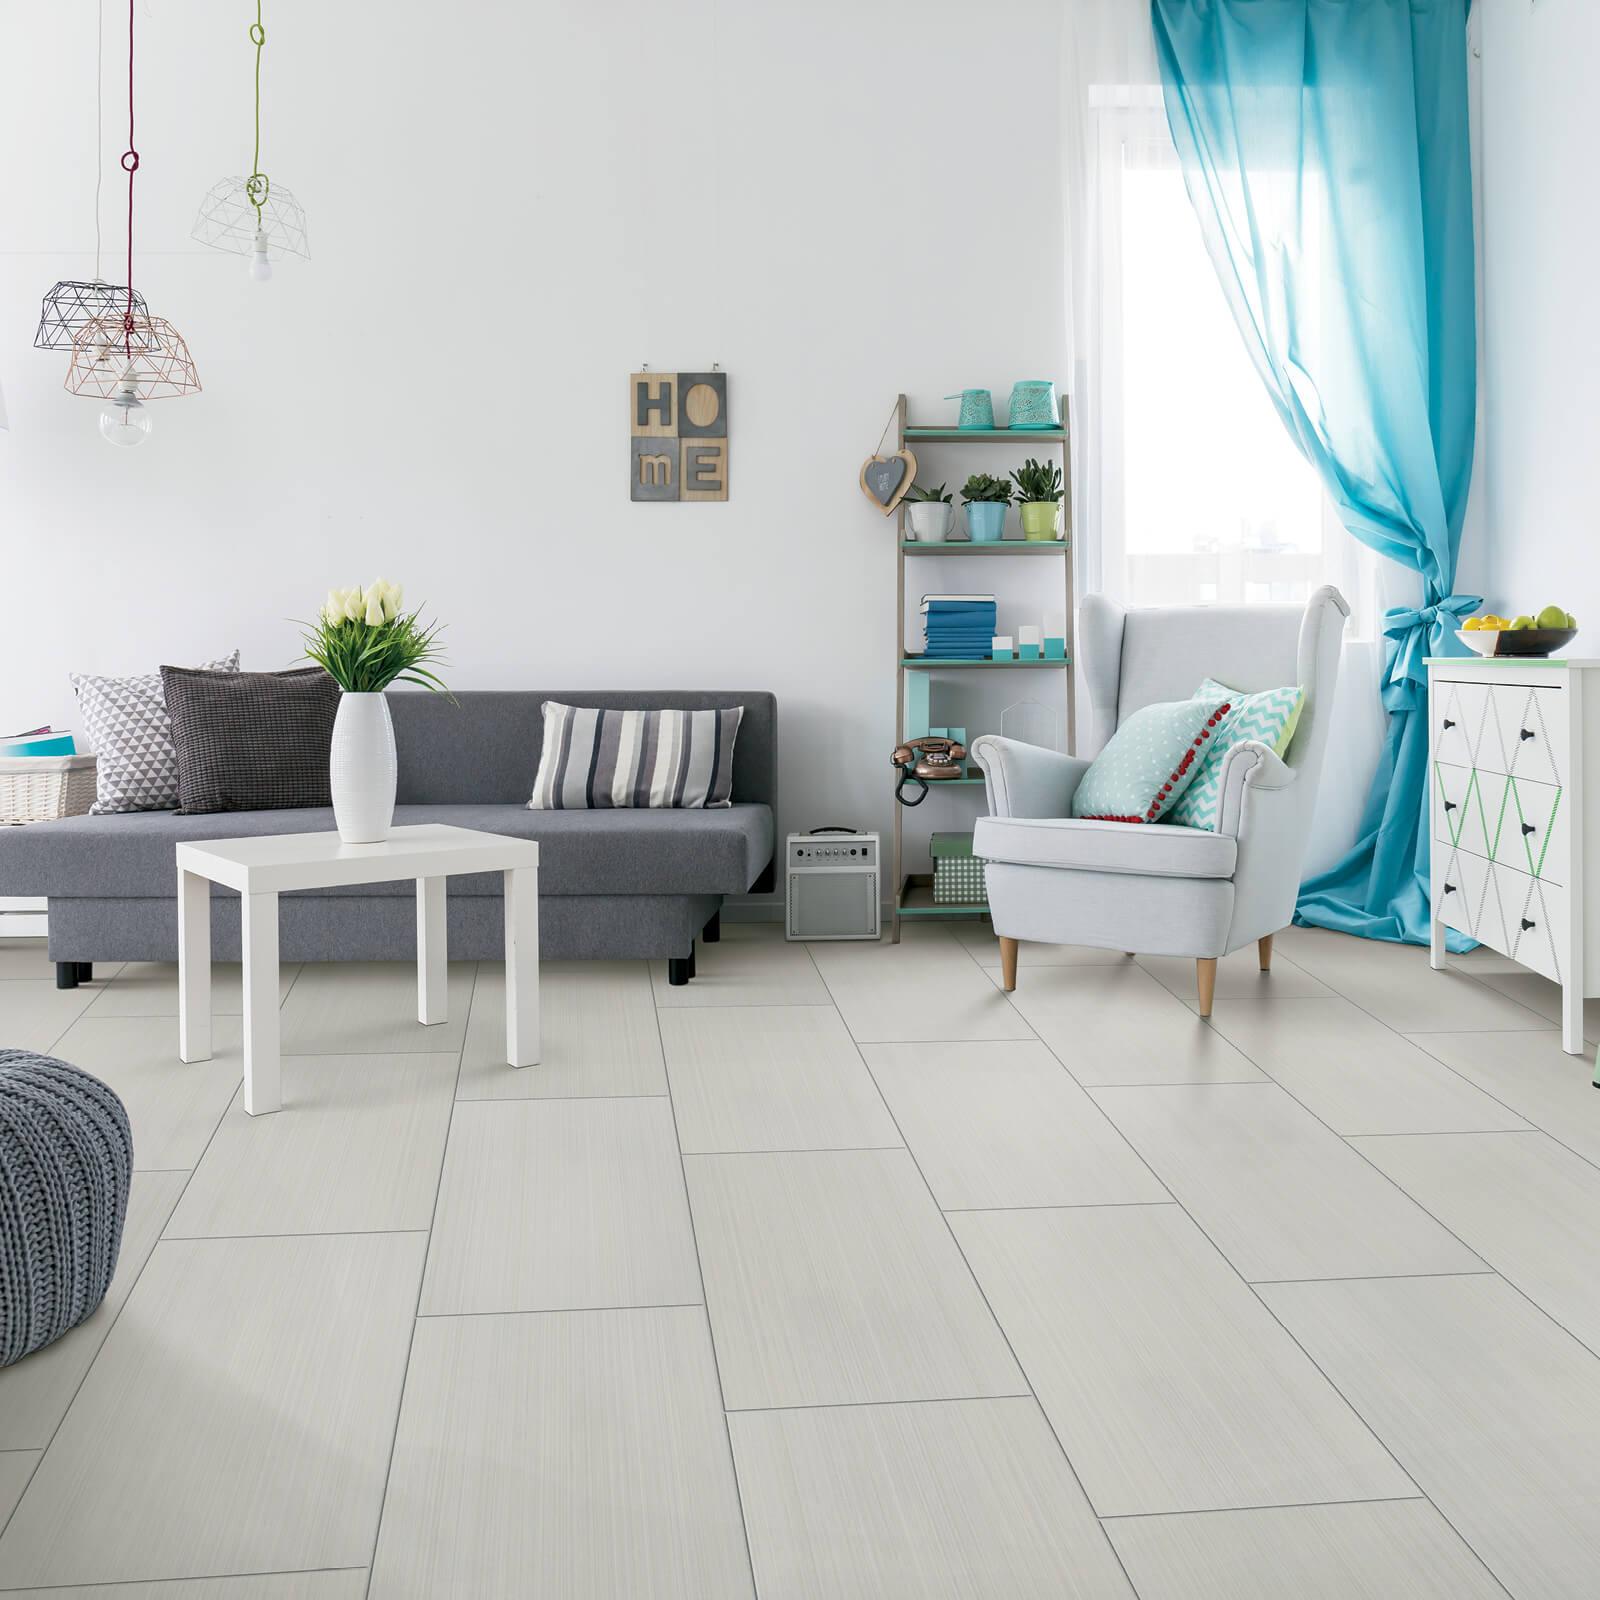 Living room flooring | McSwain Carpet & Floors